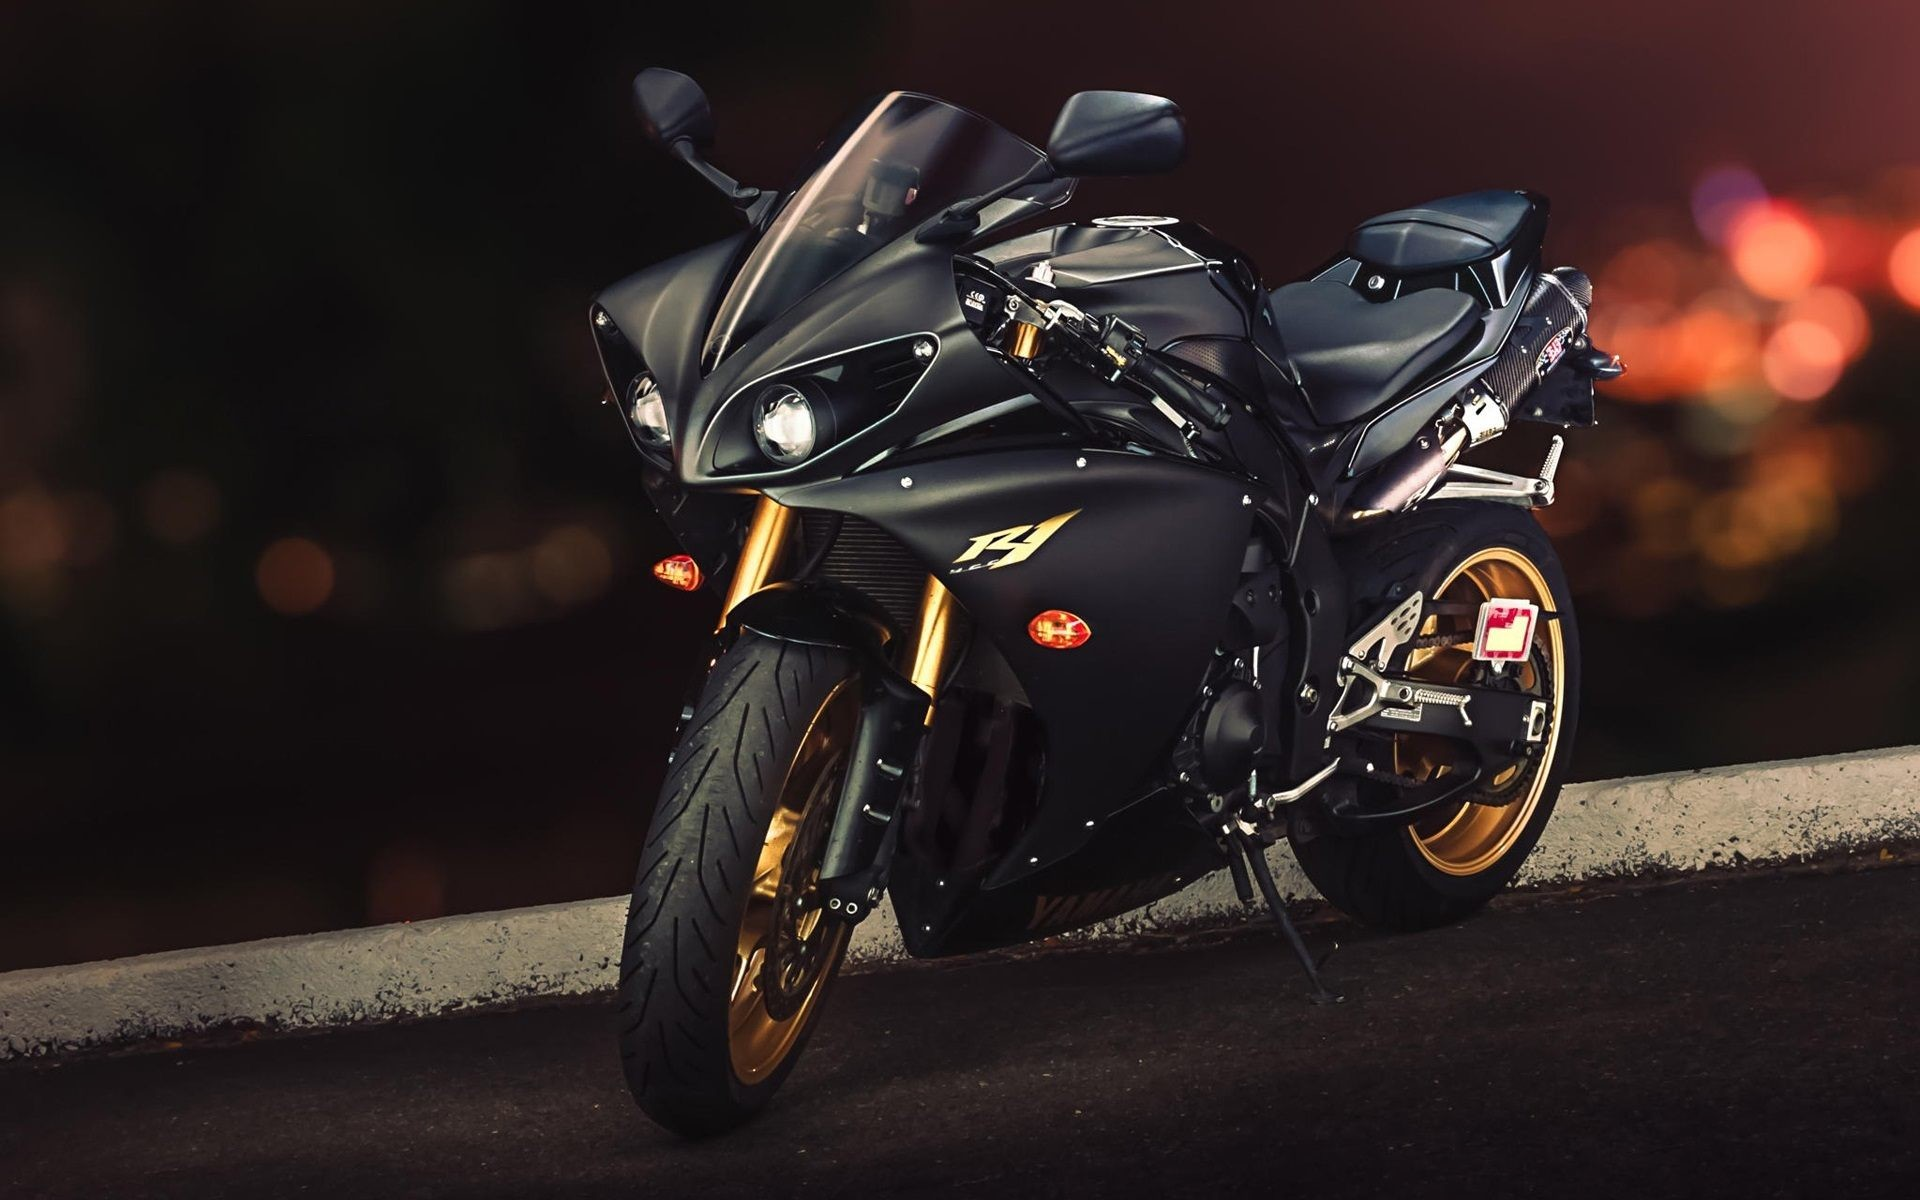 Motorcycles HD Wallpapers WallpaperFX · Motorcycle WallpaperWallpaper Free  DownloadGirl …